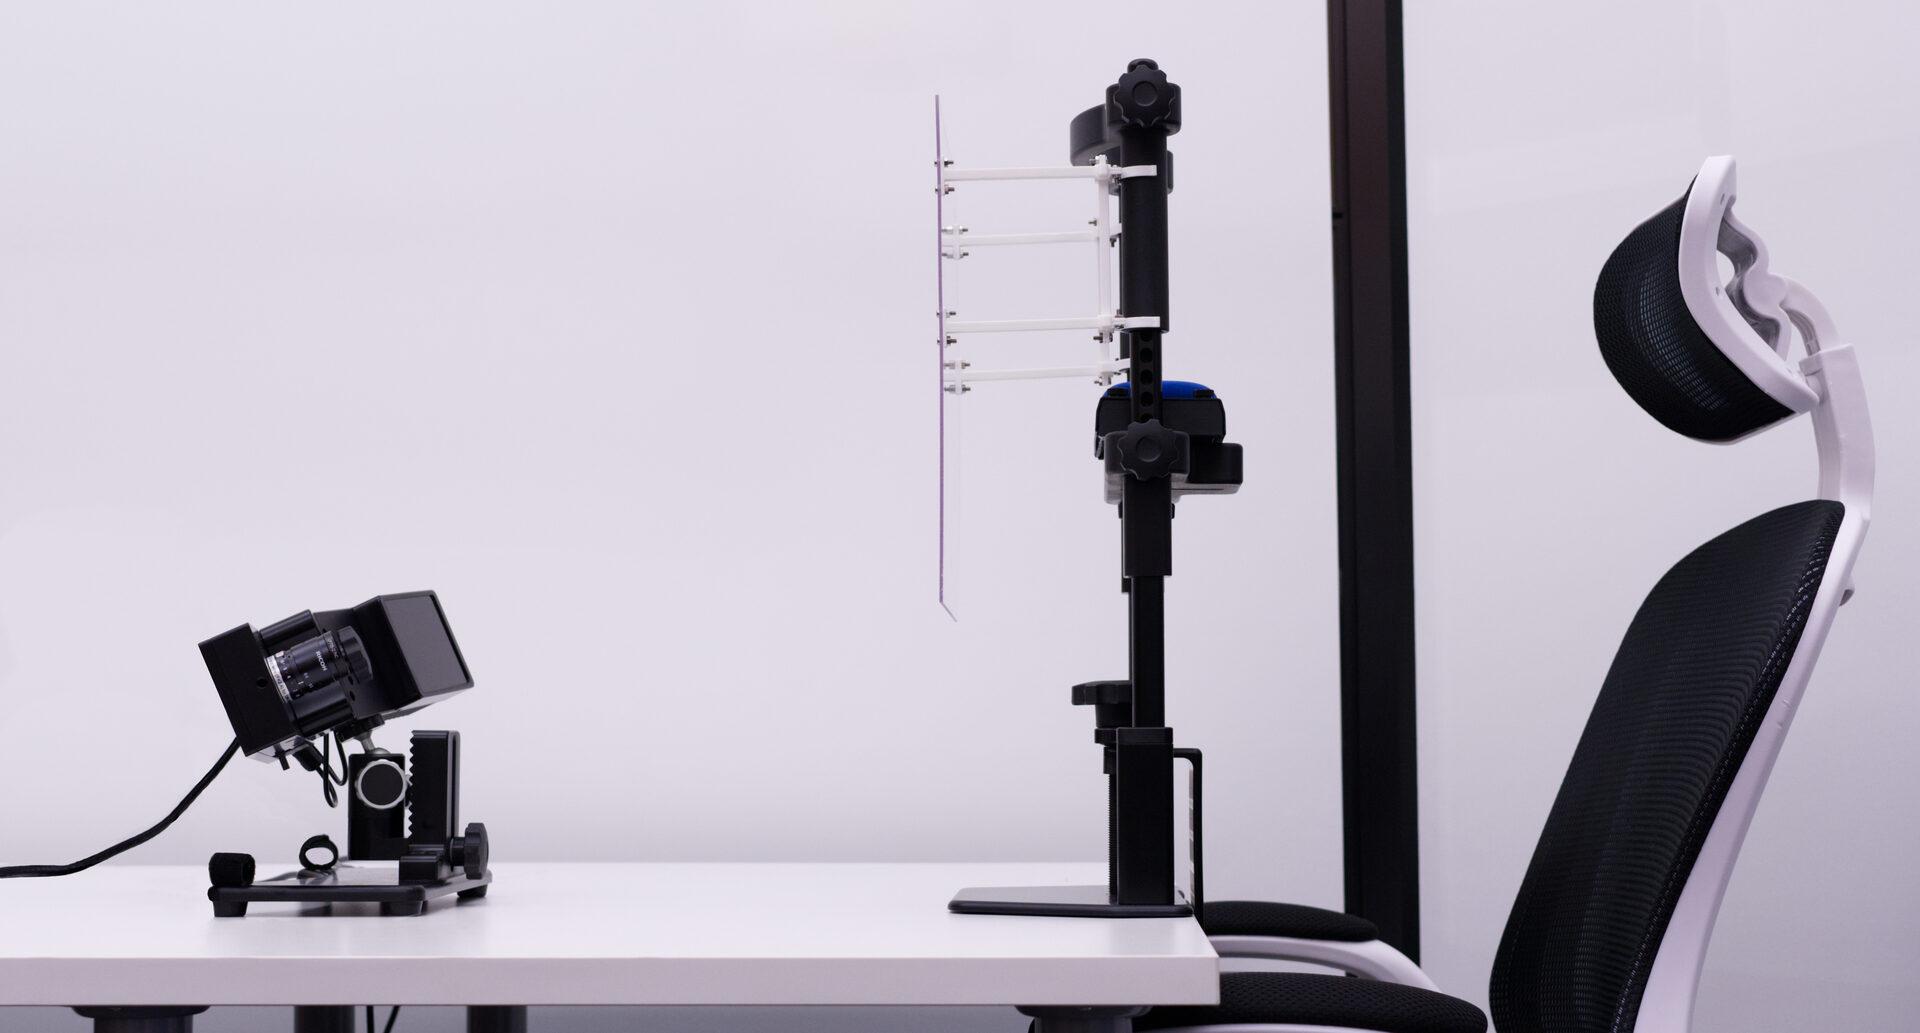 Eye tracker Setup